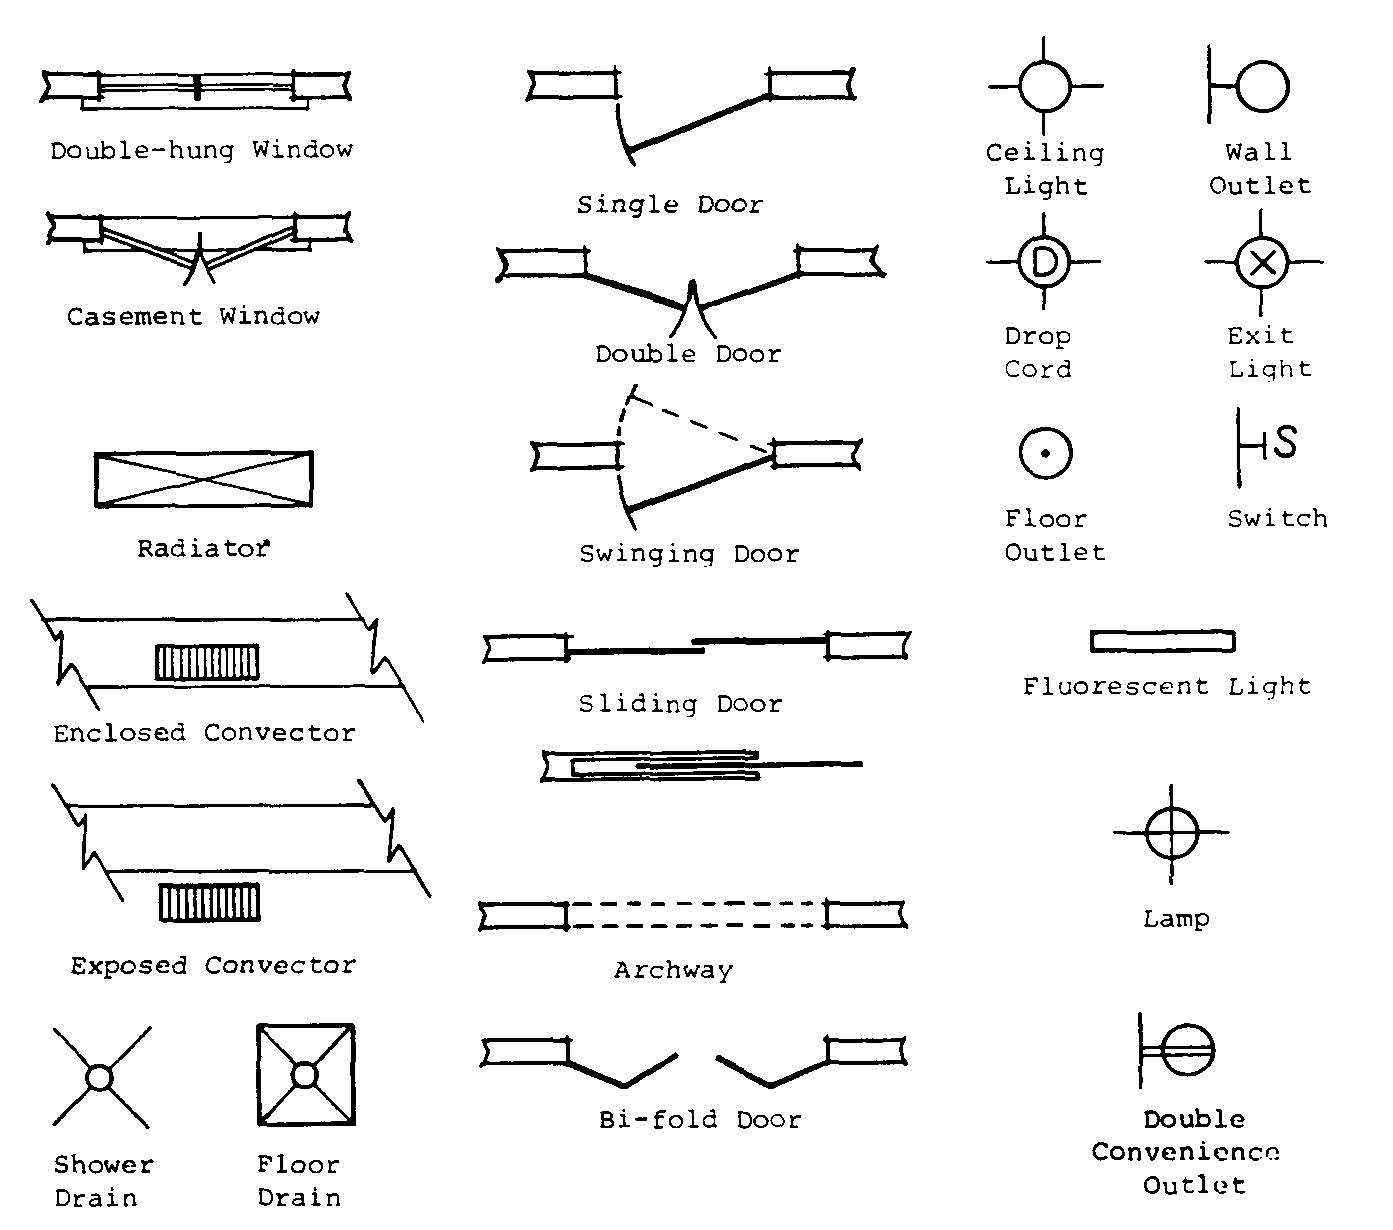 Architectural Symbols Floor Plan Symbols Interior Design Plan Floor Plan Design